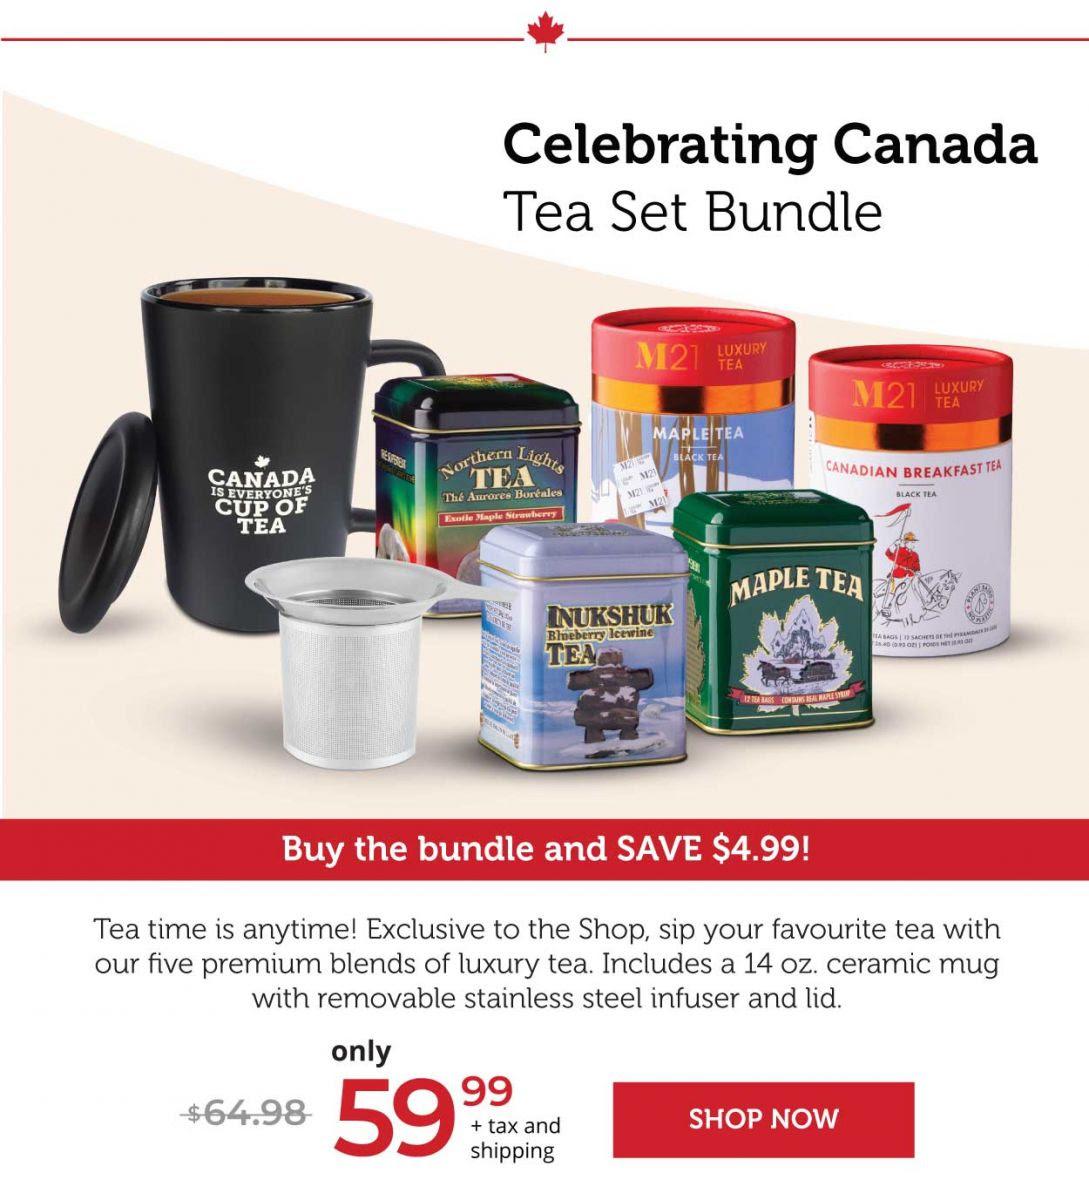 Celebrating Canada 5-Tea Set Bundle